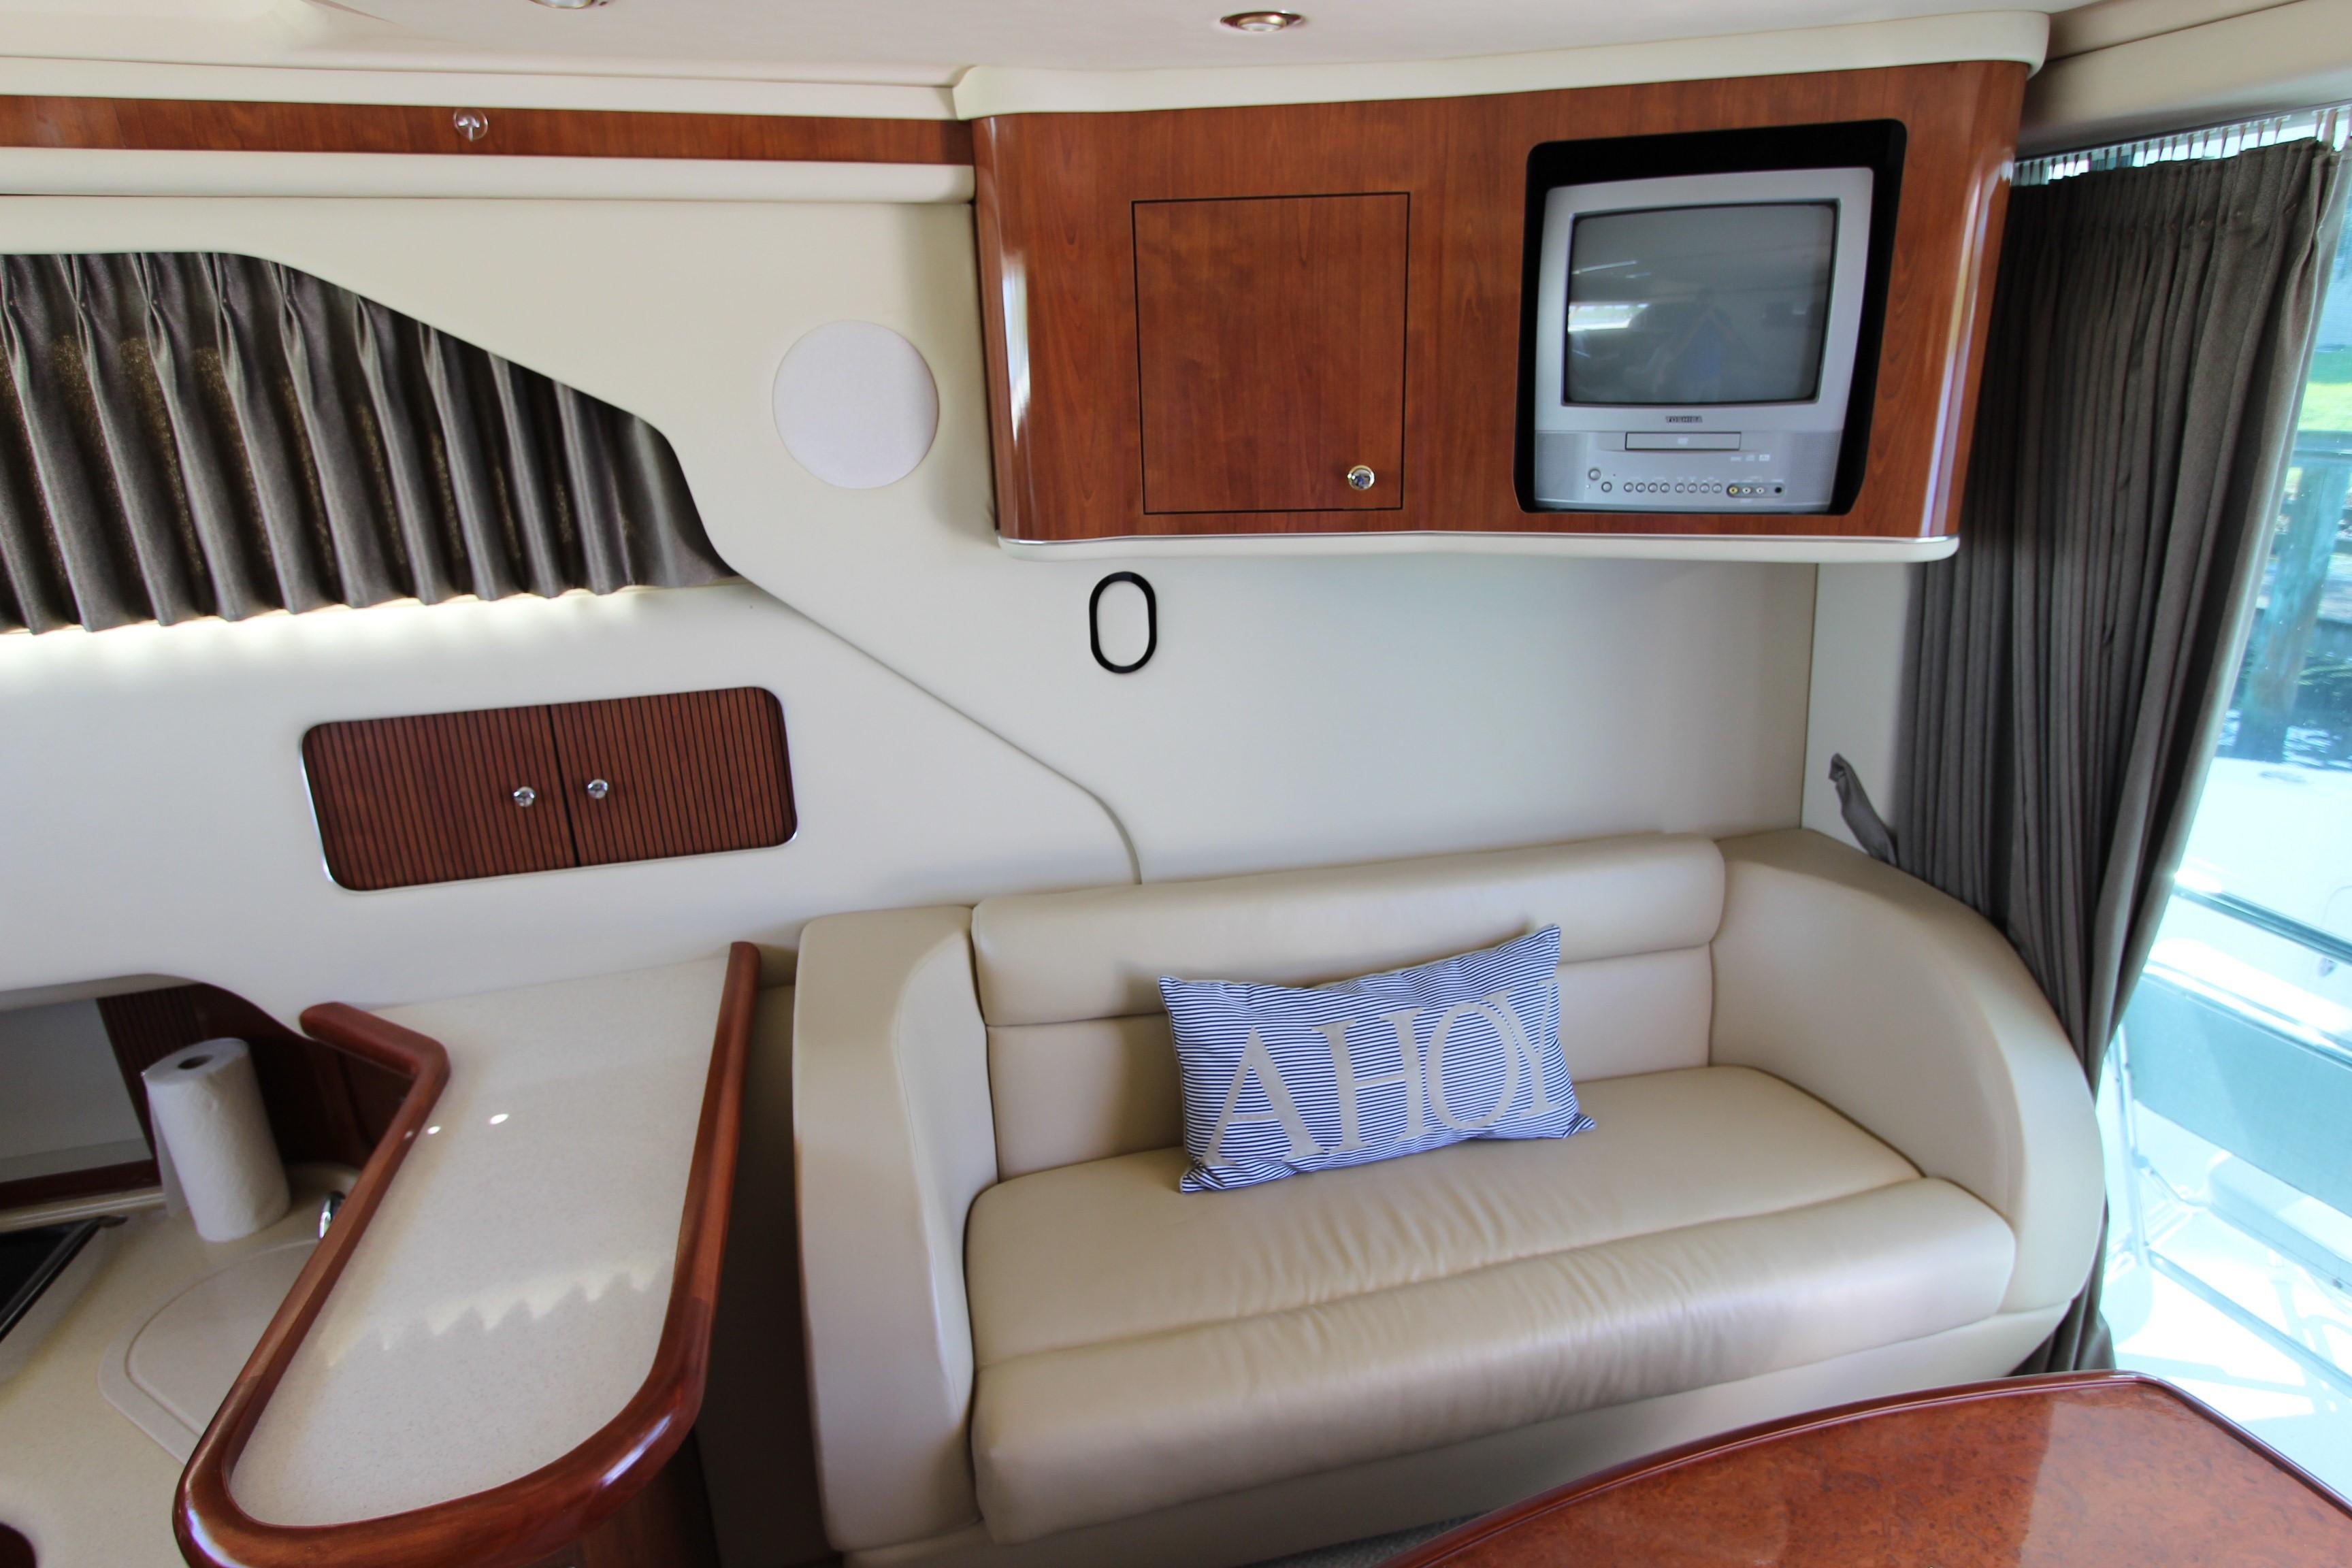 6338999_20170817104418140_1_XLARGE&w=924&h=693&t=1502995534000 2003 sea ray 400 sedan bridge power boat for sale www yachtworld com  at webbmarketing.co